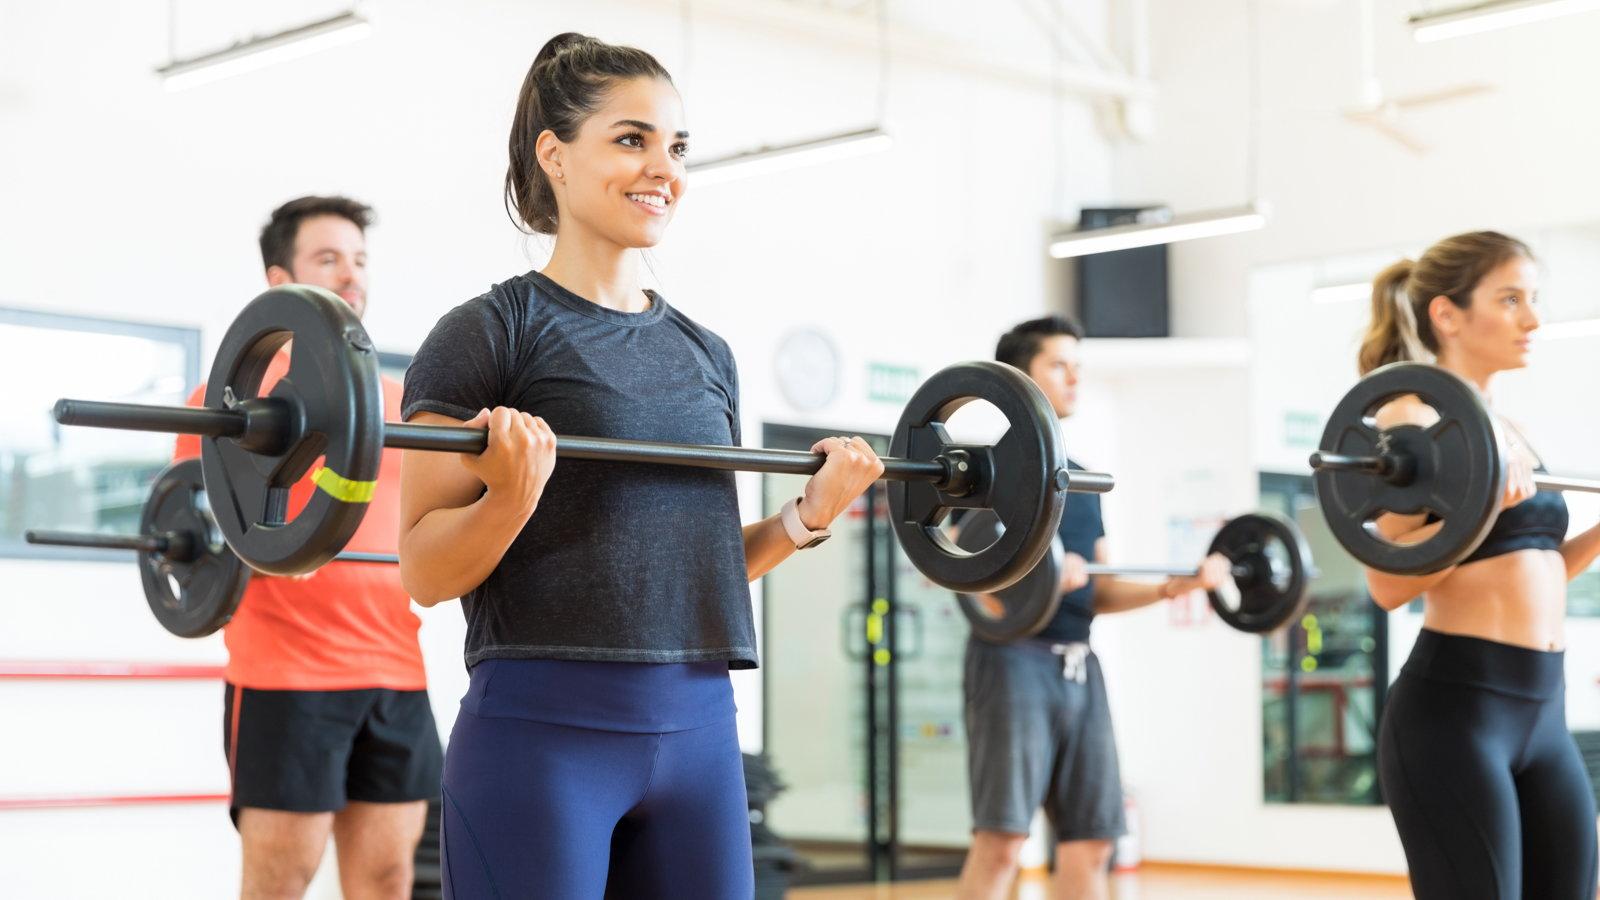 weight lifting class